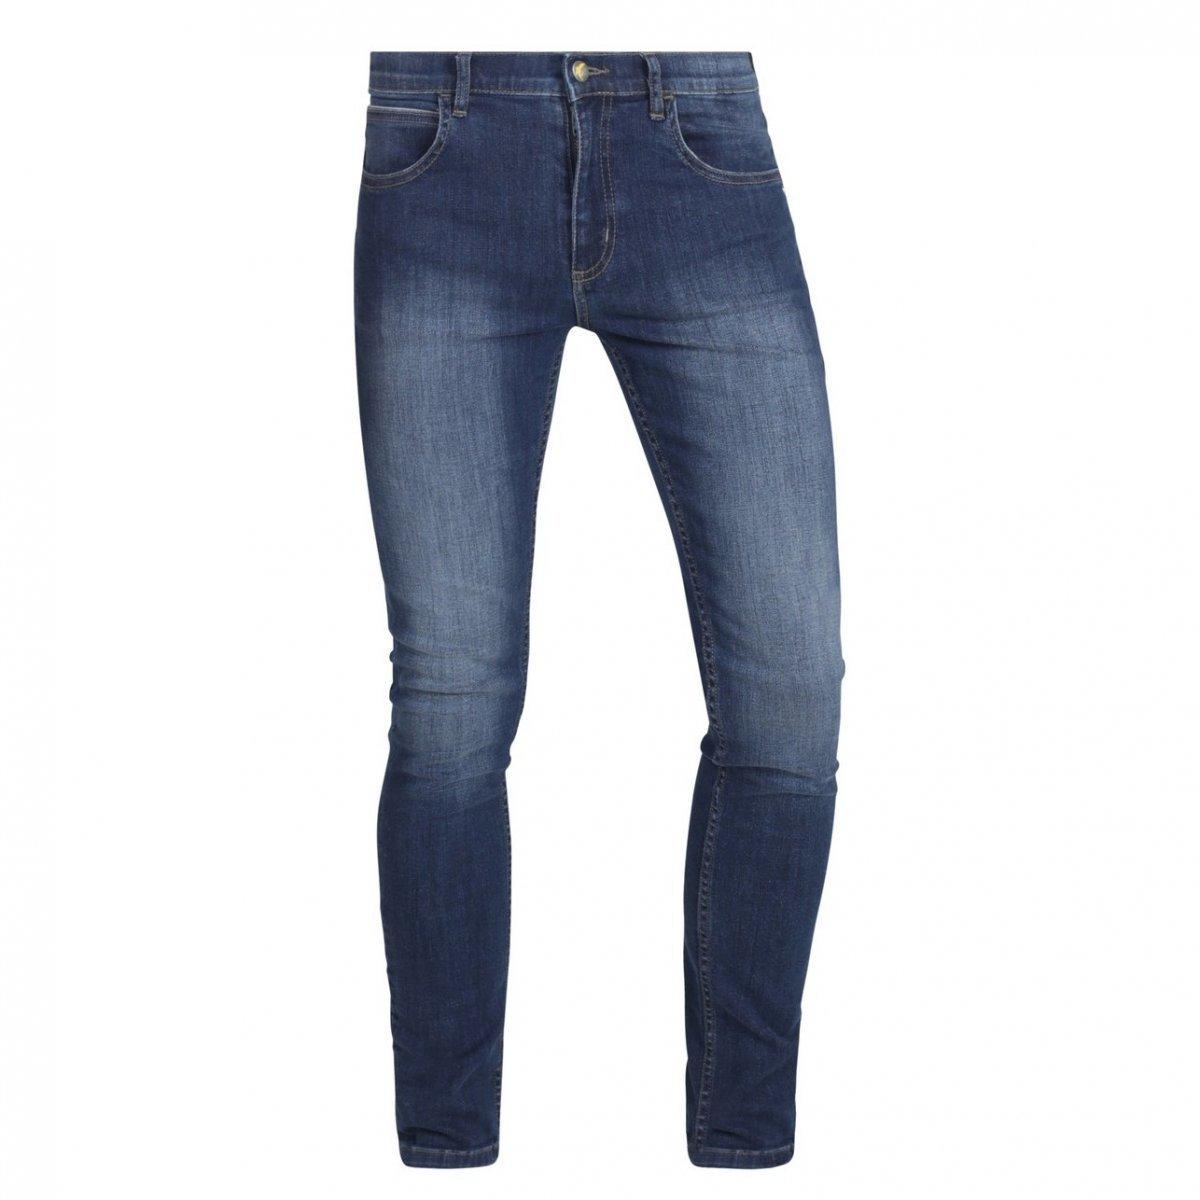 Jeans Classic Skinny Dark cotone biologico